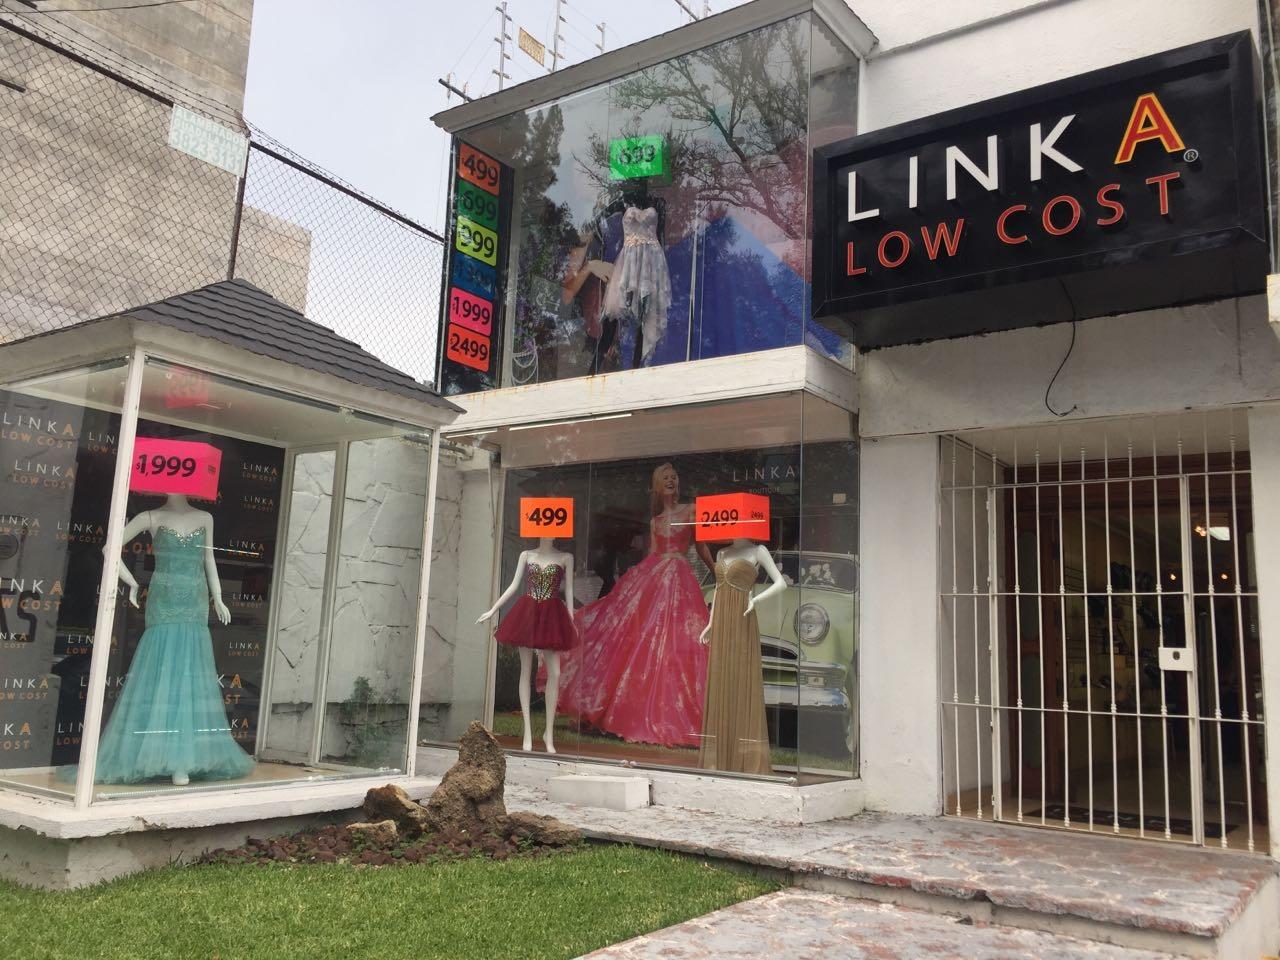 Linka Lowcost Providencia